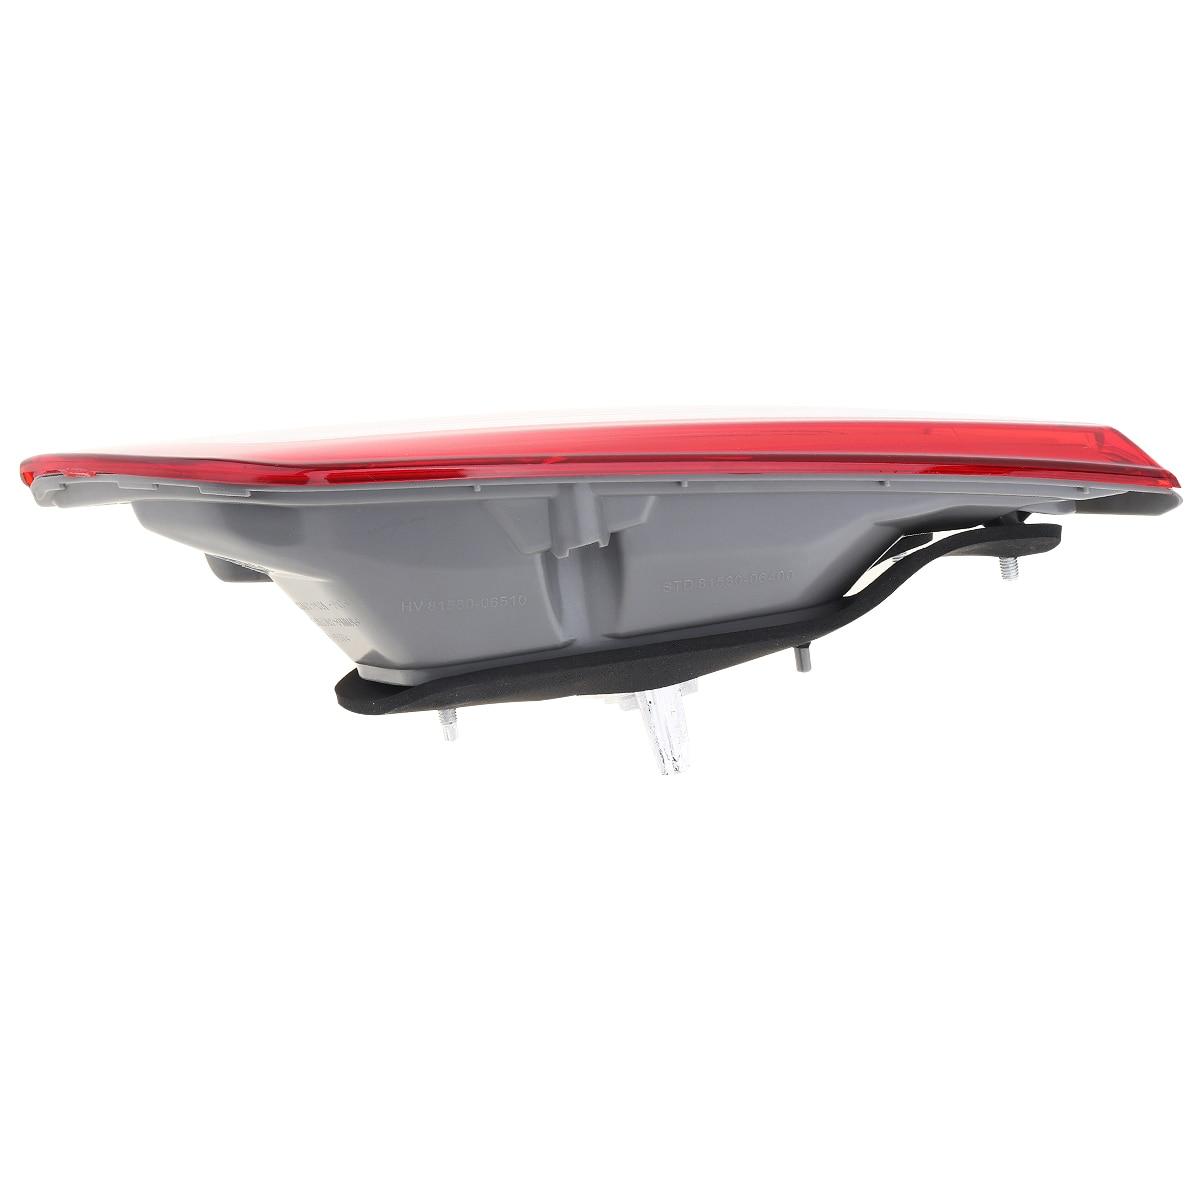 Купить с кэшбэком Waterproof Durable Inter Tail Light Left Side LH Reuse Stock Bulbs Fit for Toyota Camry ACV51 / 2011 - 2014 Car Tail Lights